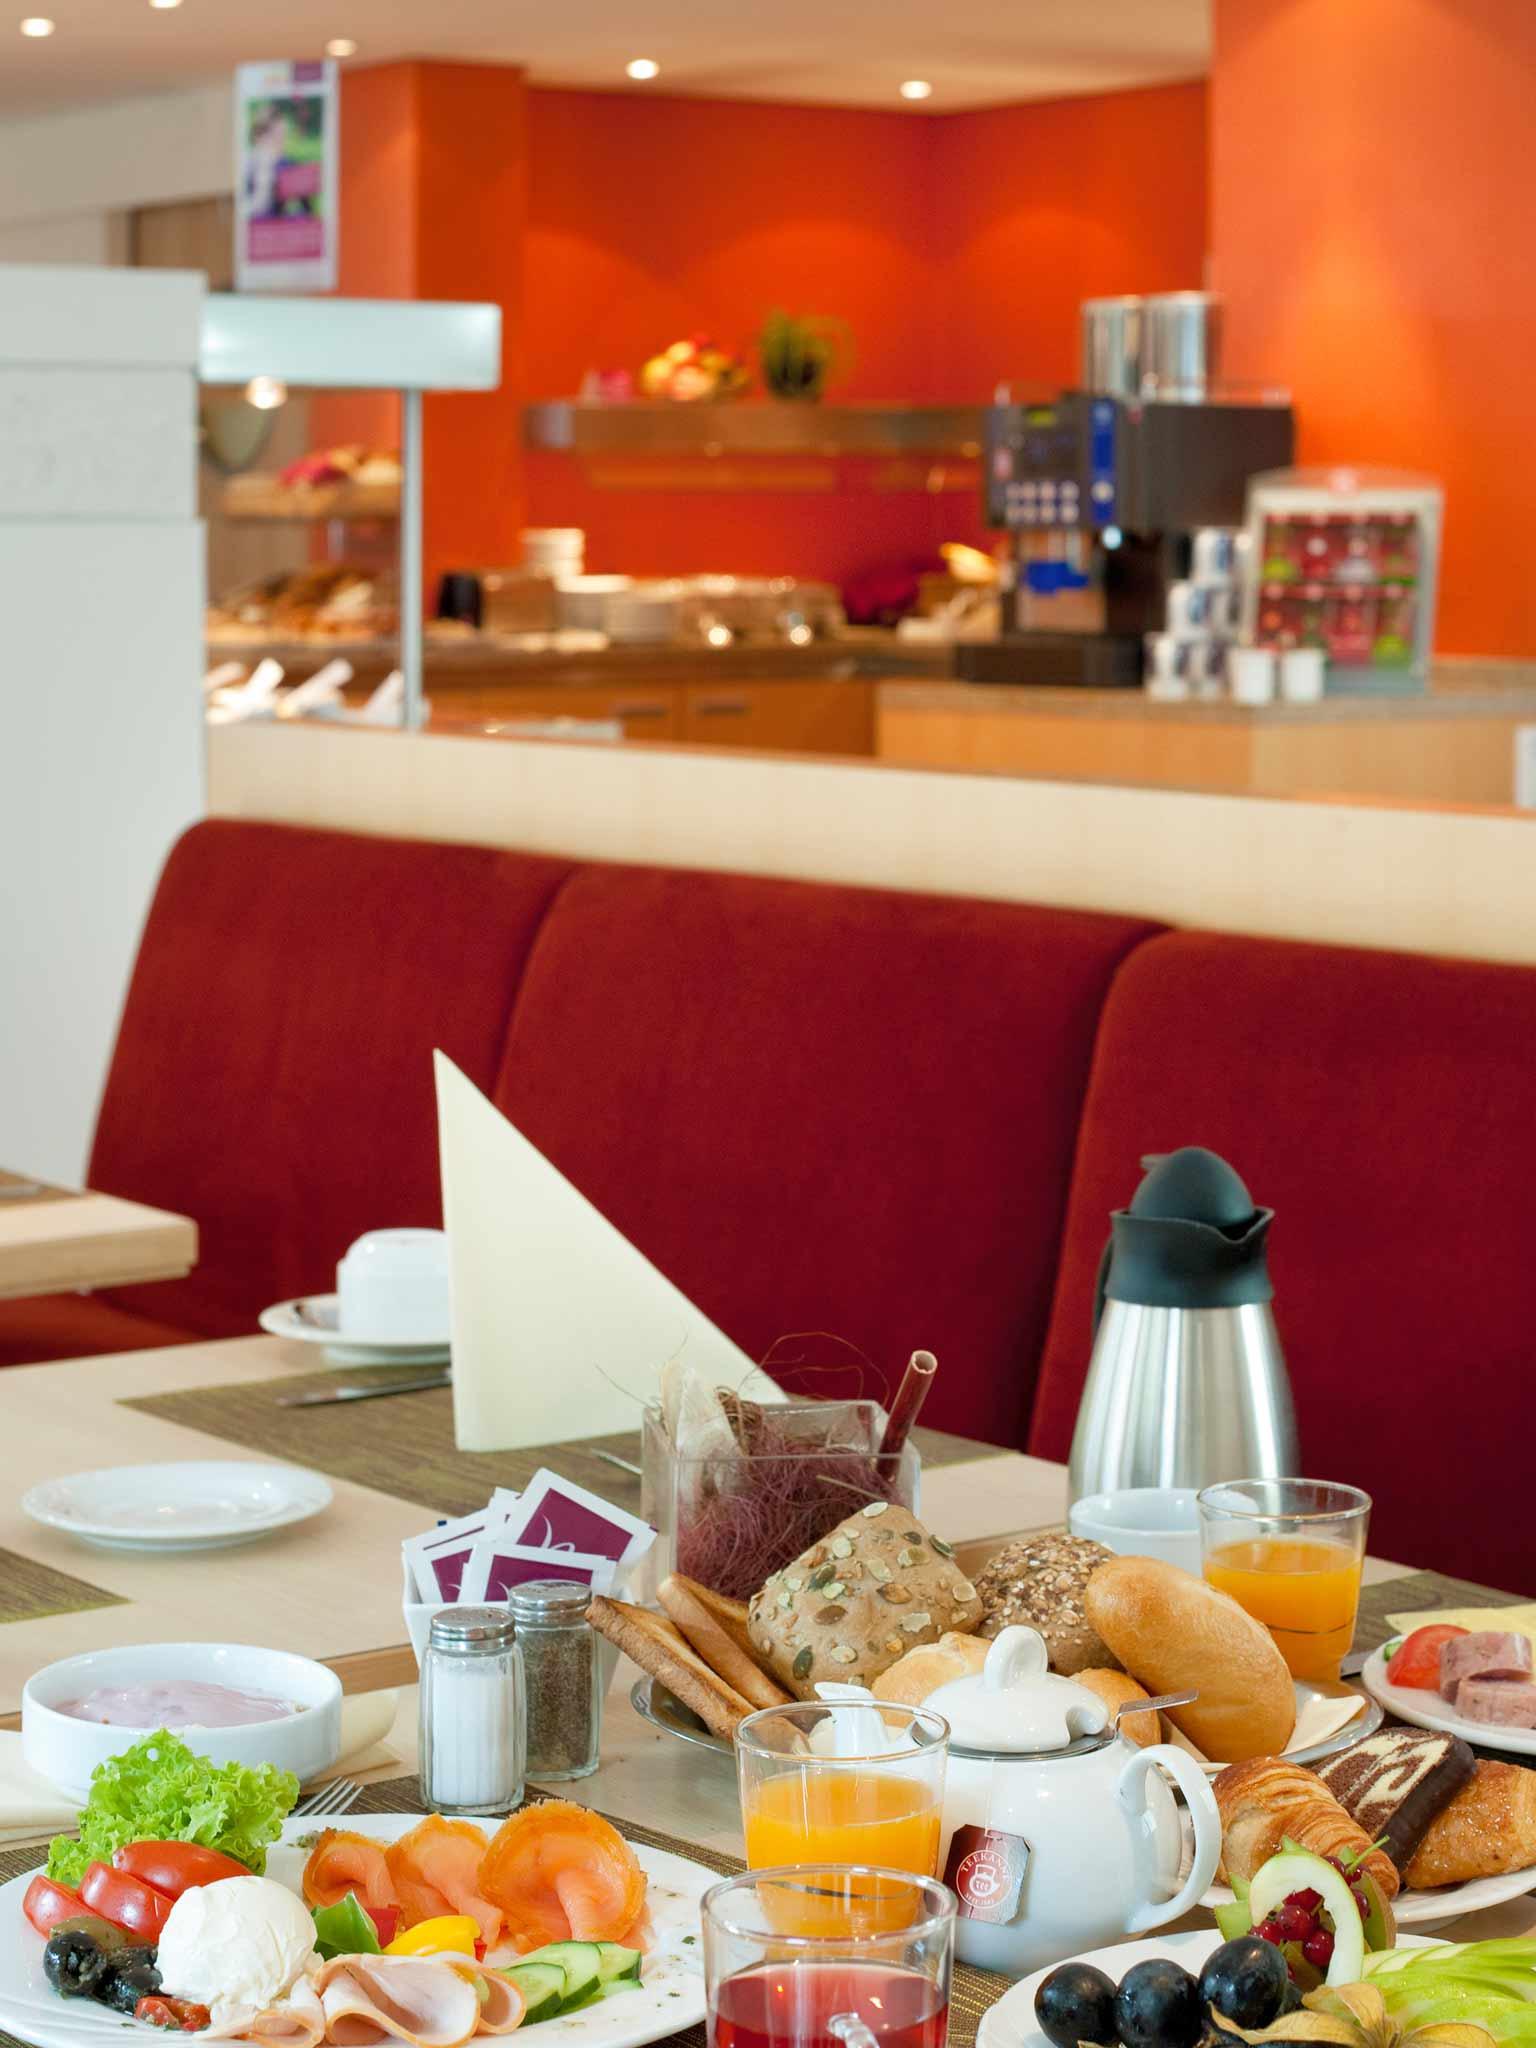 Mercure Hotel Aachen am Dom 餐饮设施